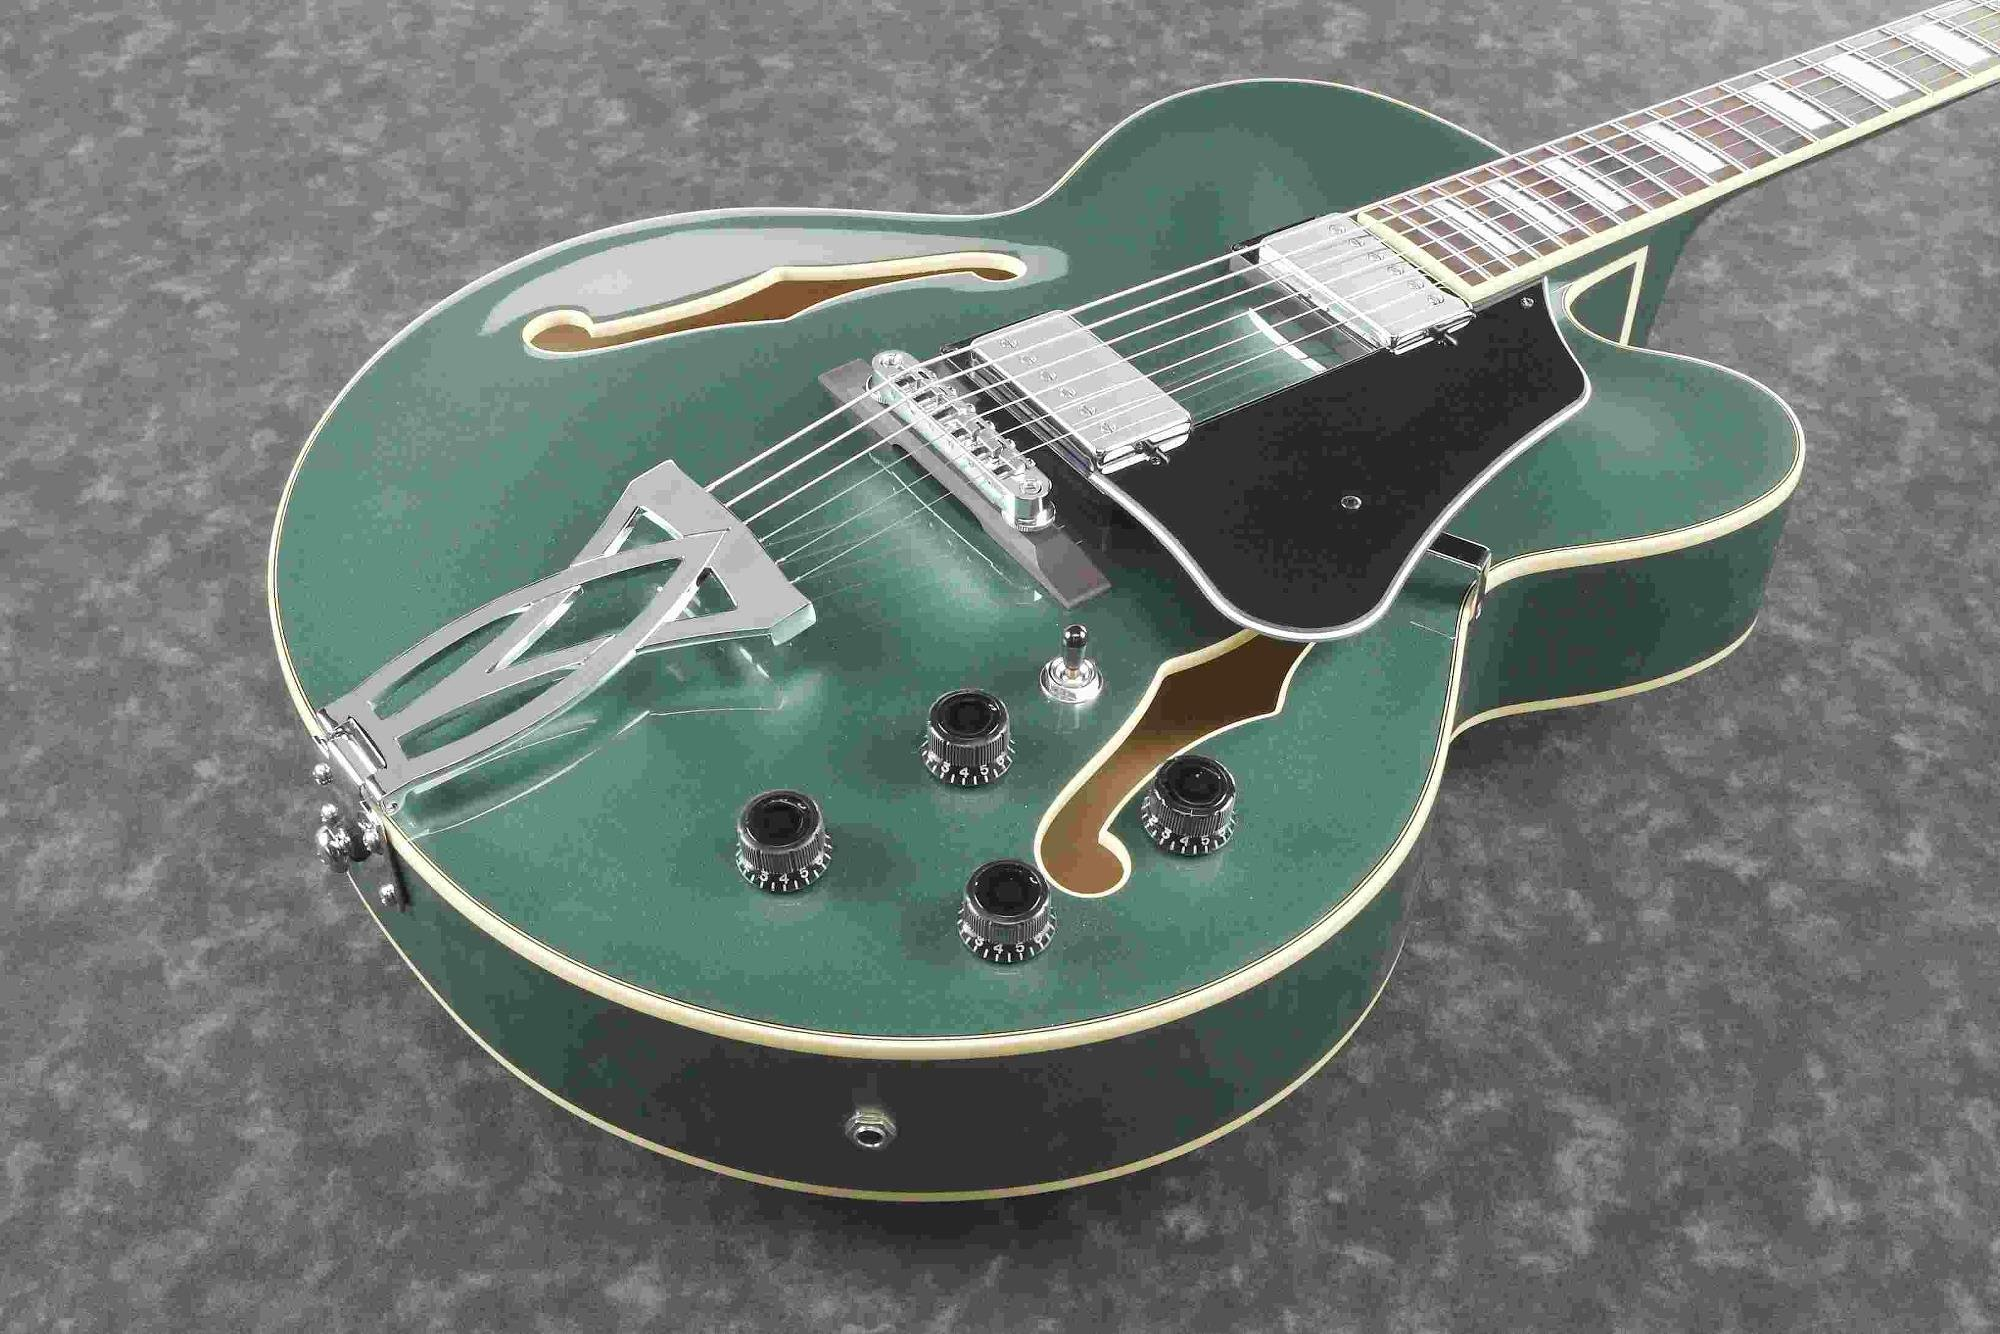 Ibanez Artcore AF75OLM - Hollowbody Electric Guitar - Olive Metallic